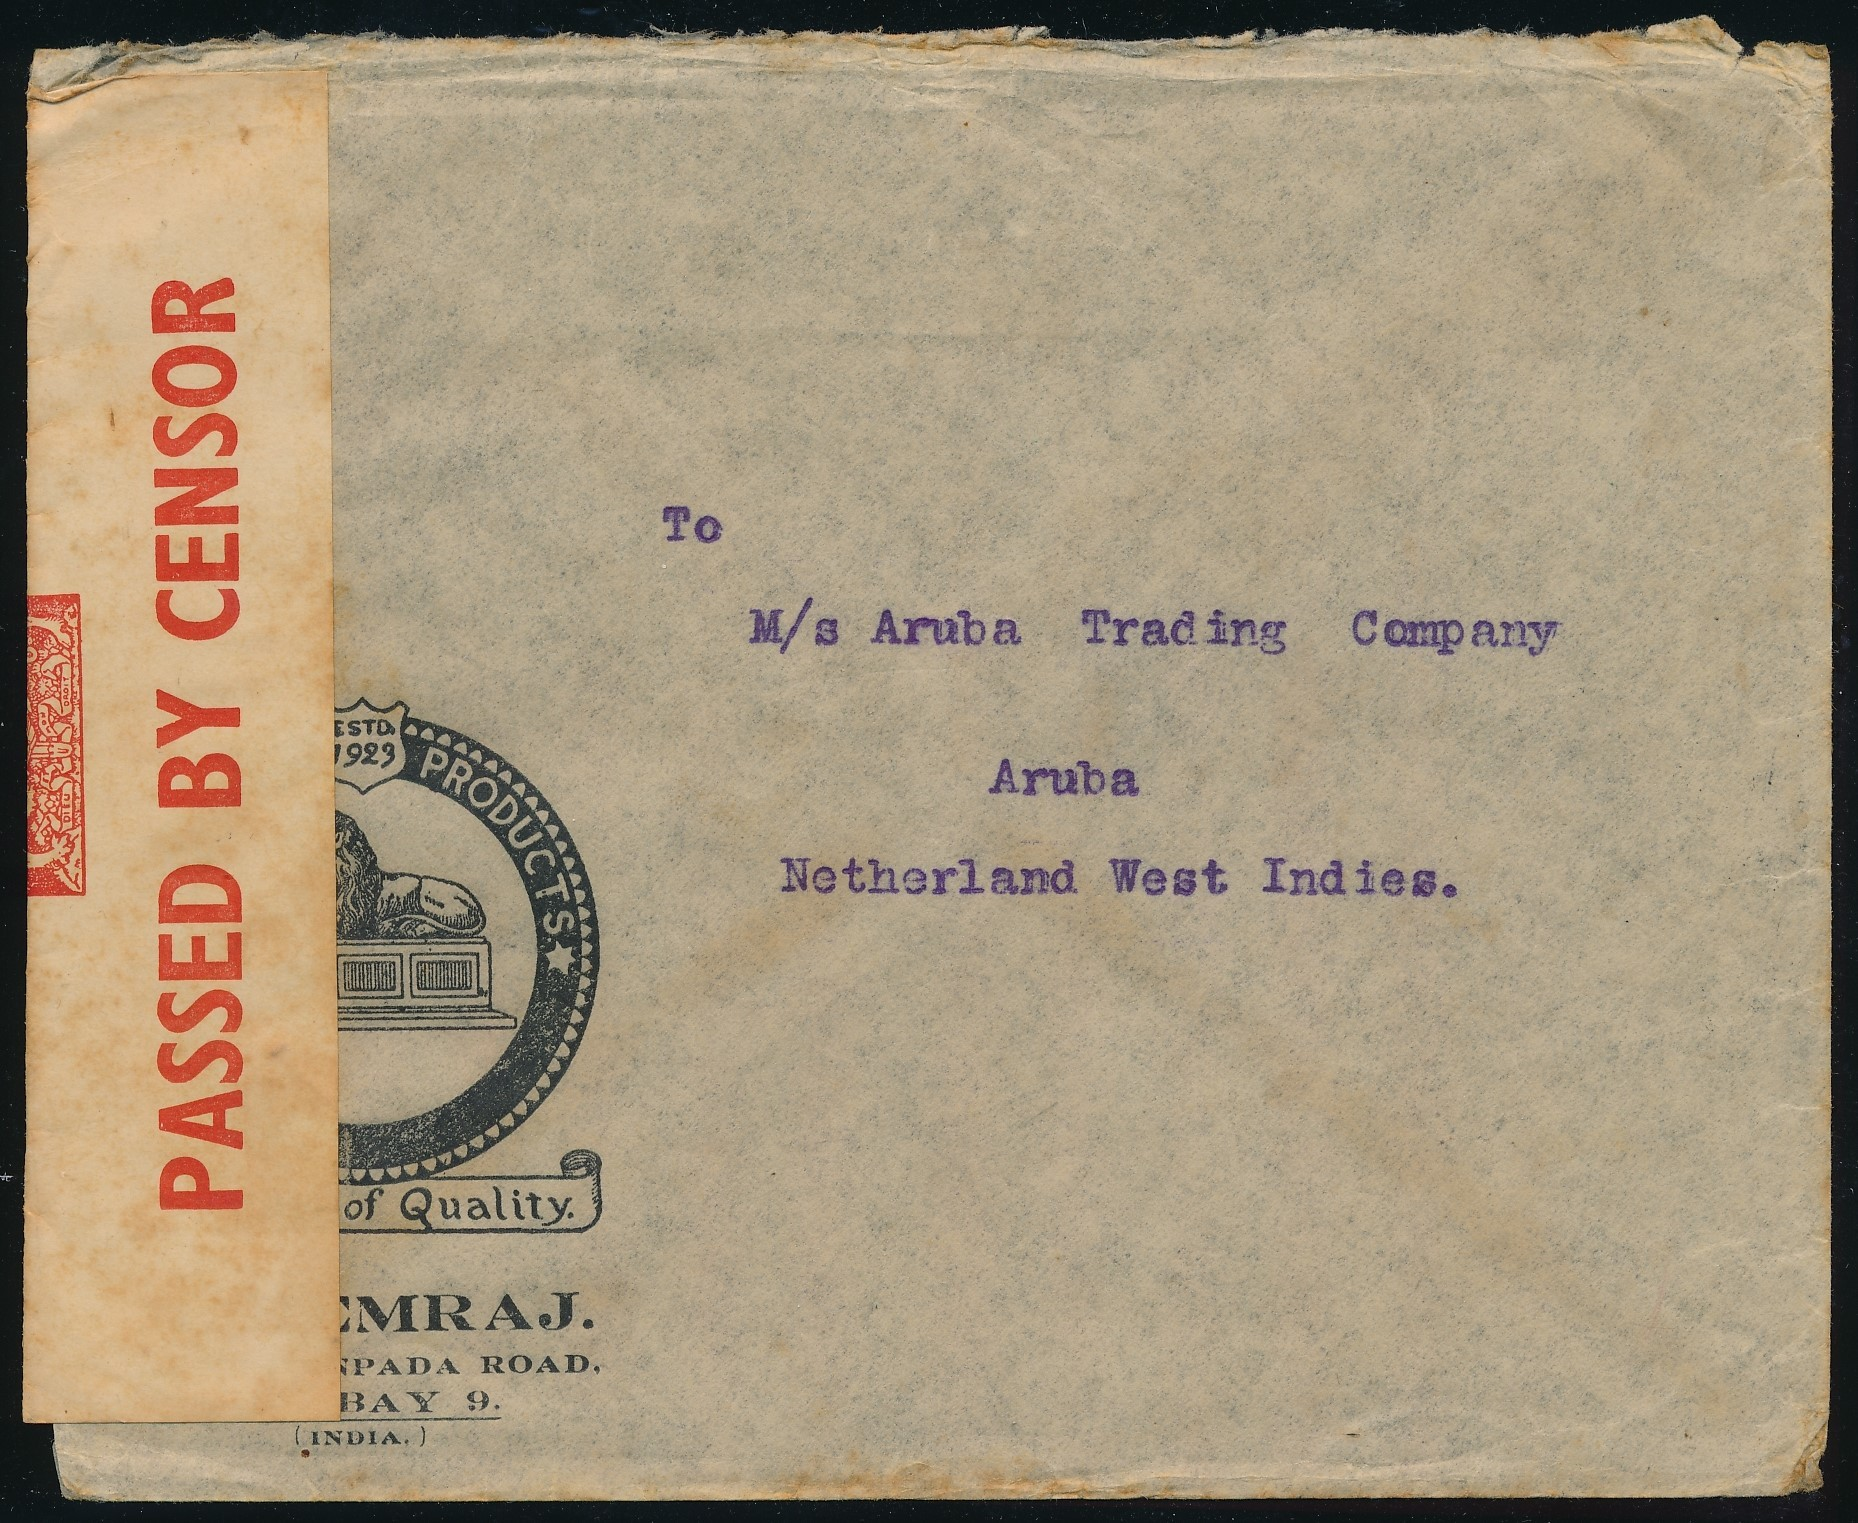 INDIA censored air cover 1940 Bombay to Aruba ARU214